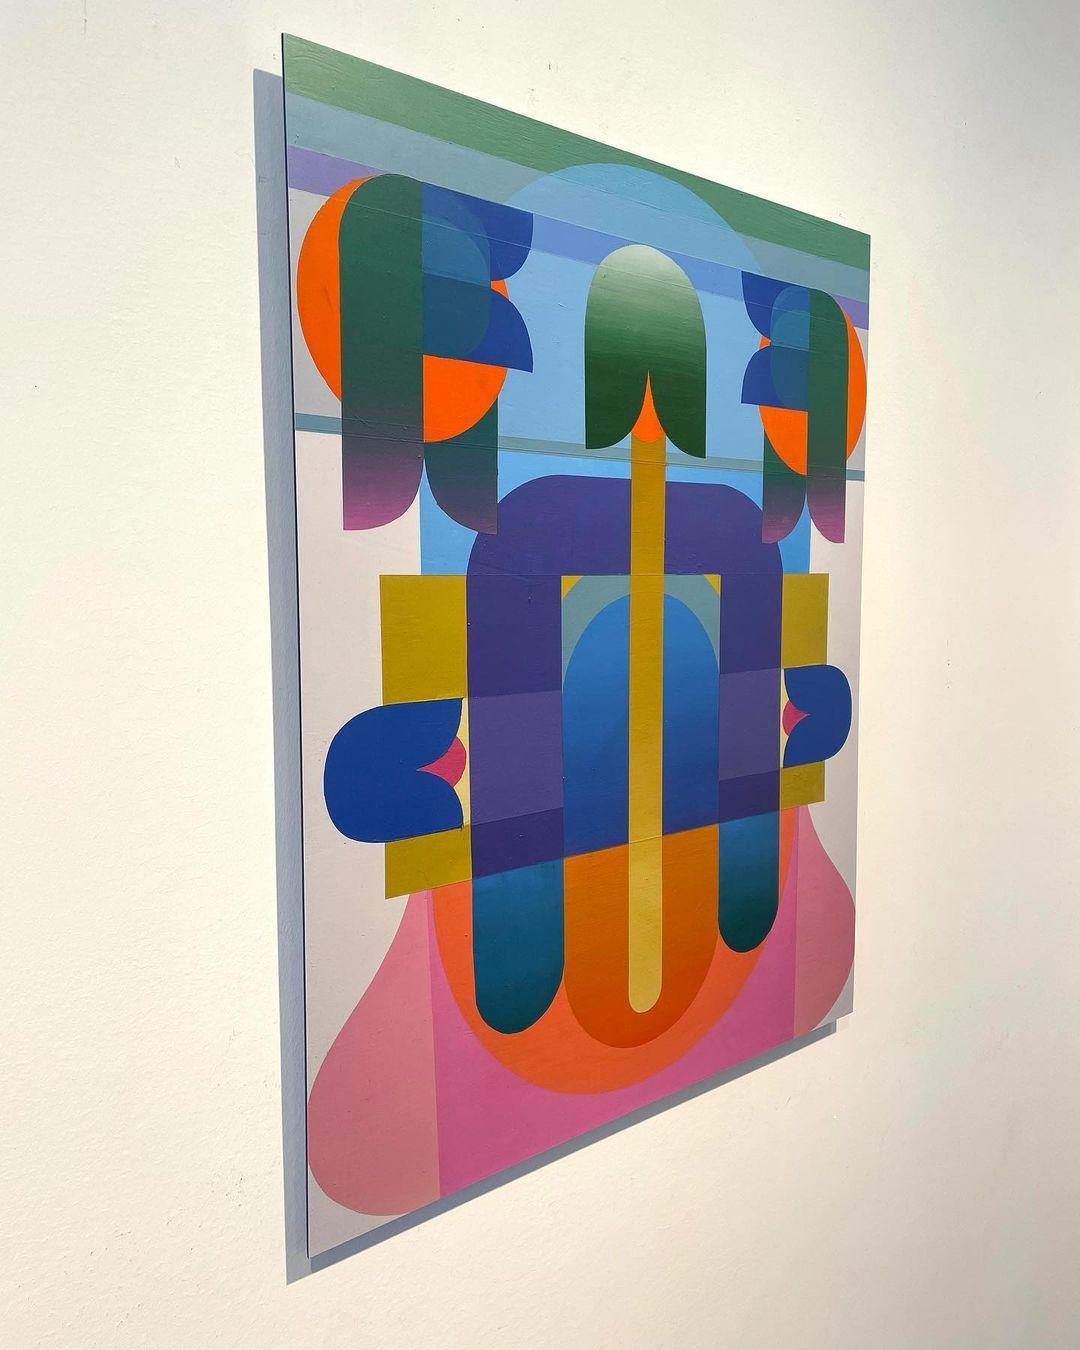 Sarah-Gee-Miller-Optima-2-30x24-Online-Art-Galleries-side-1